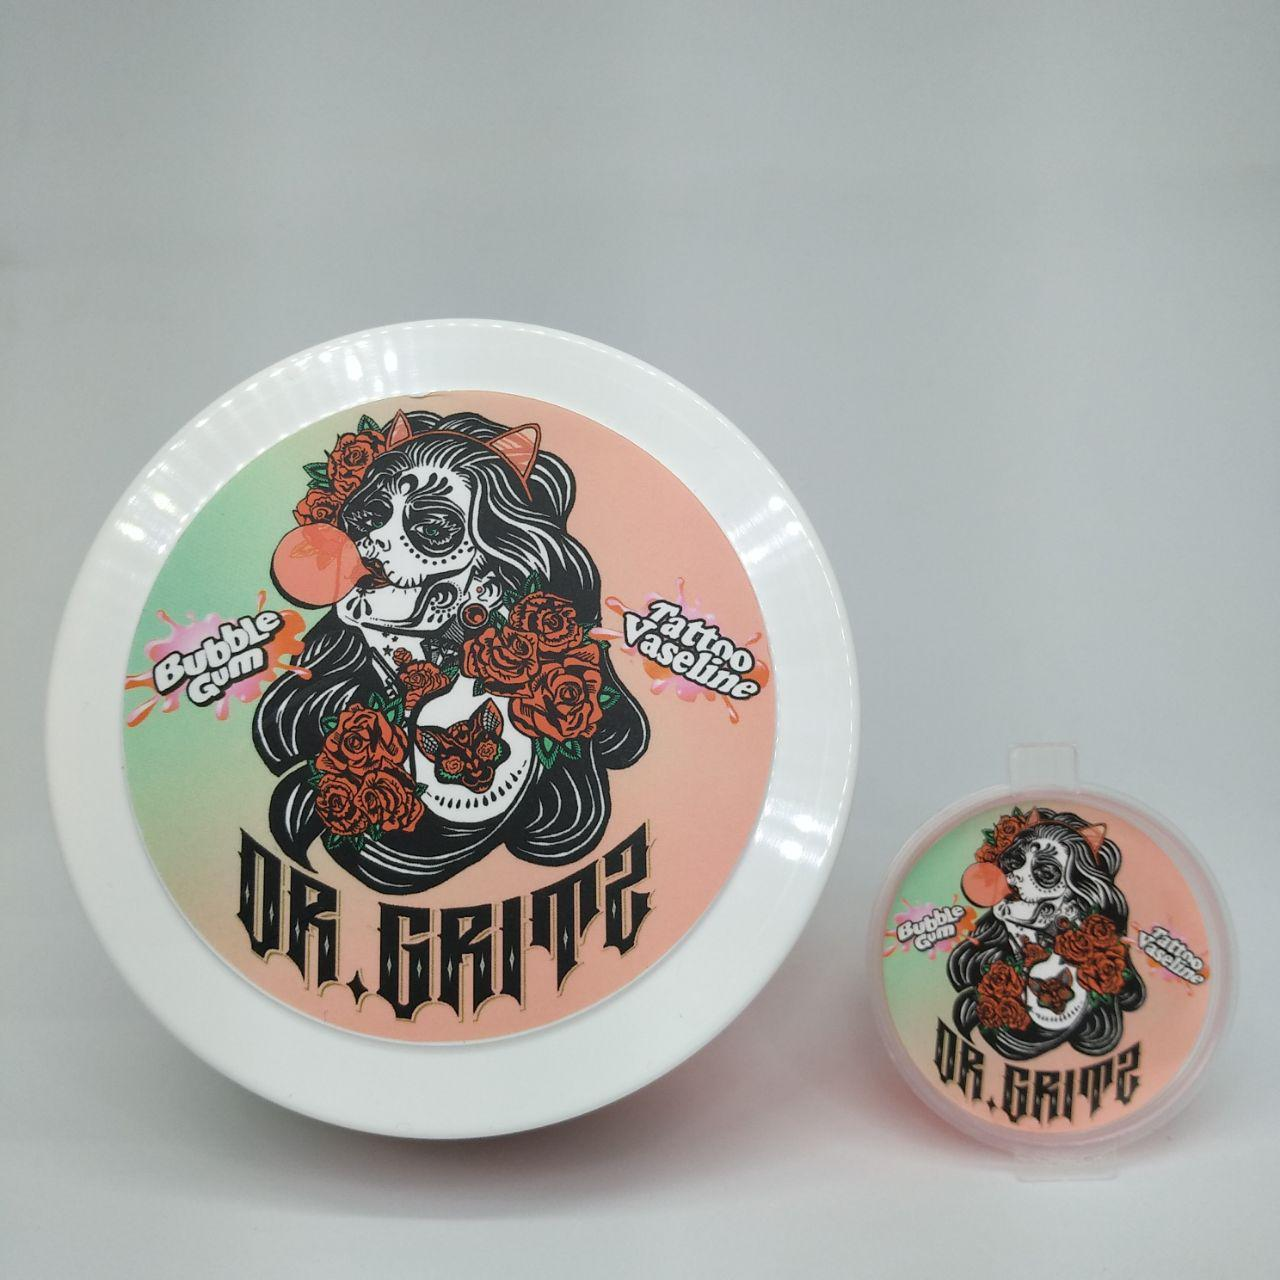 Вазелин для тату Бабл Гам Bubble Gum Tattoo Vaseline 300 мл